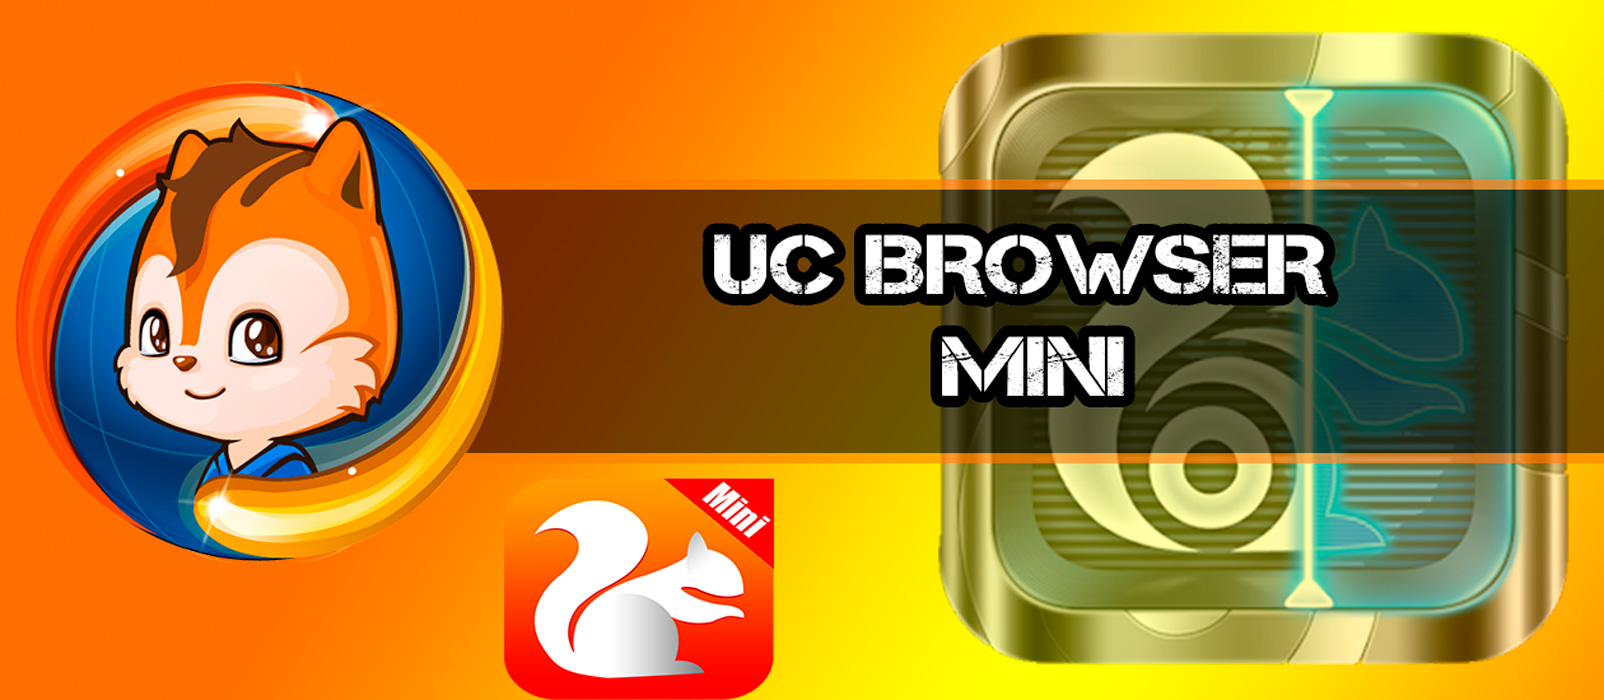 chto-takoe-Uc-Browser-Mini